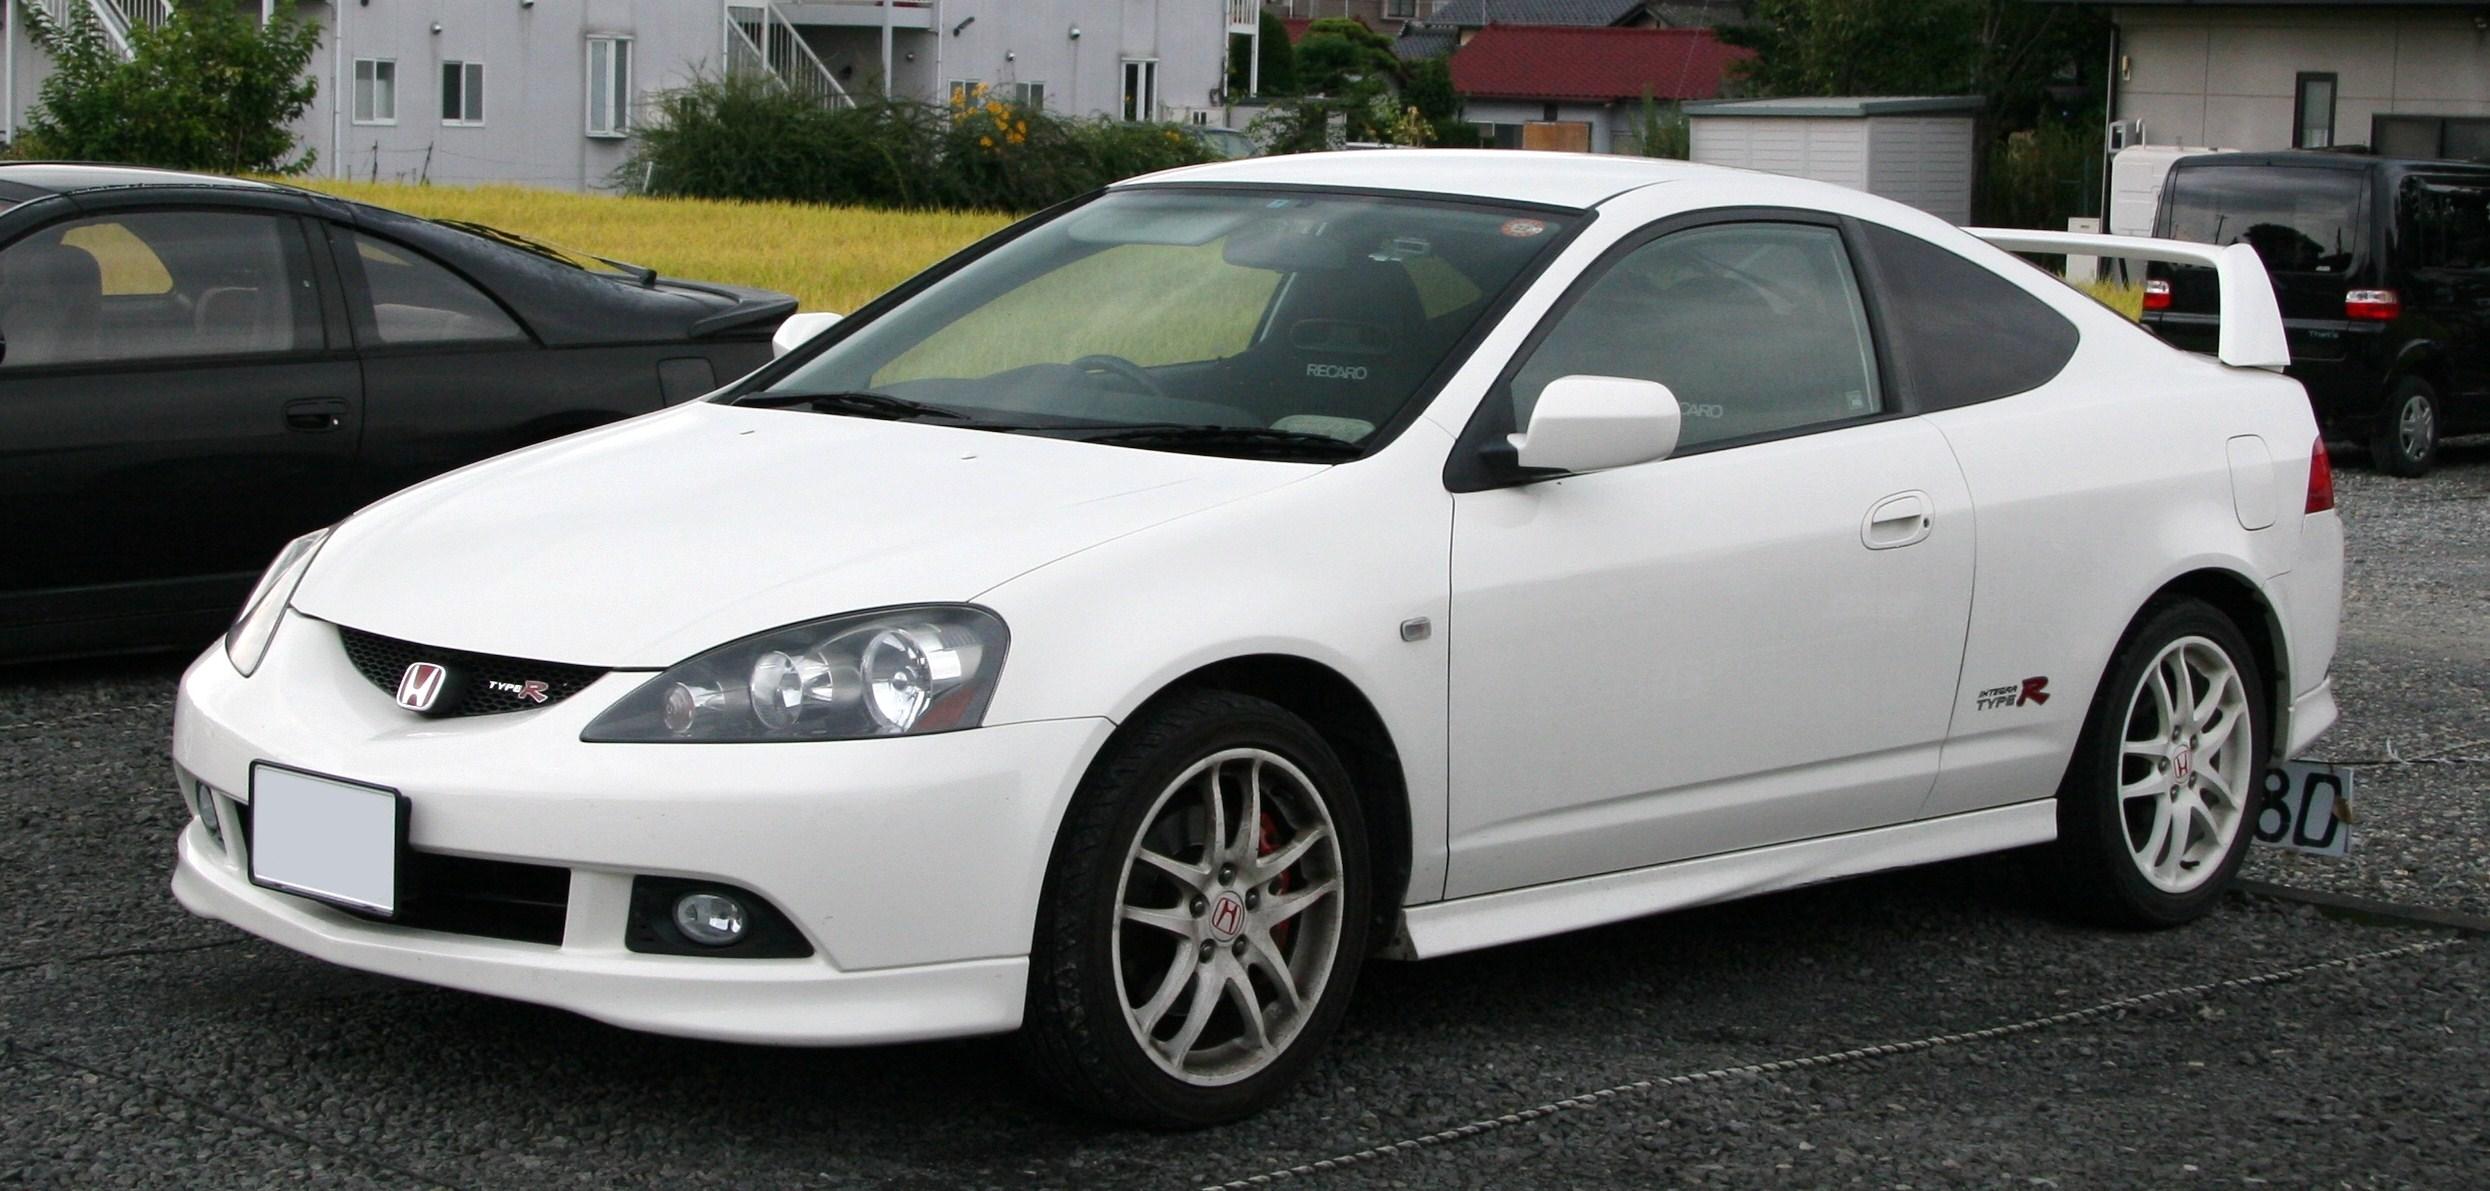 Honda Integra Coupe Dc B D on 1998 Acura Integra Rear Suspension